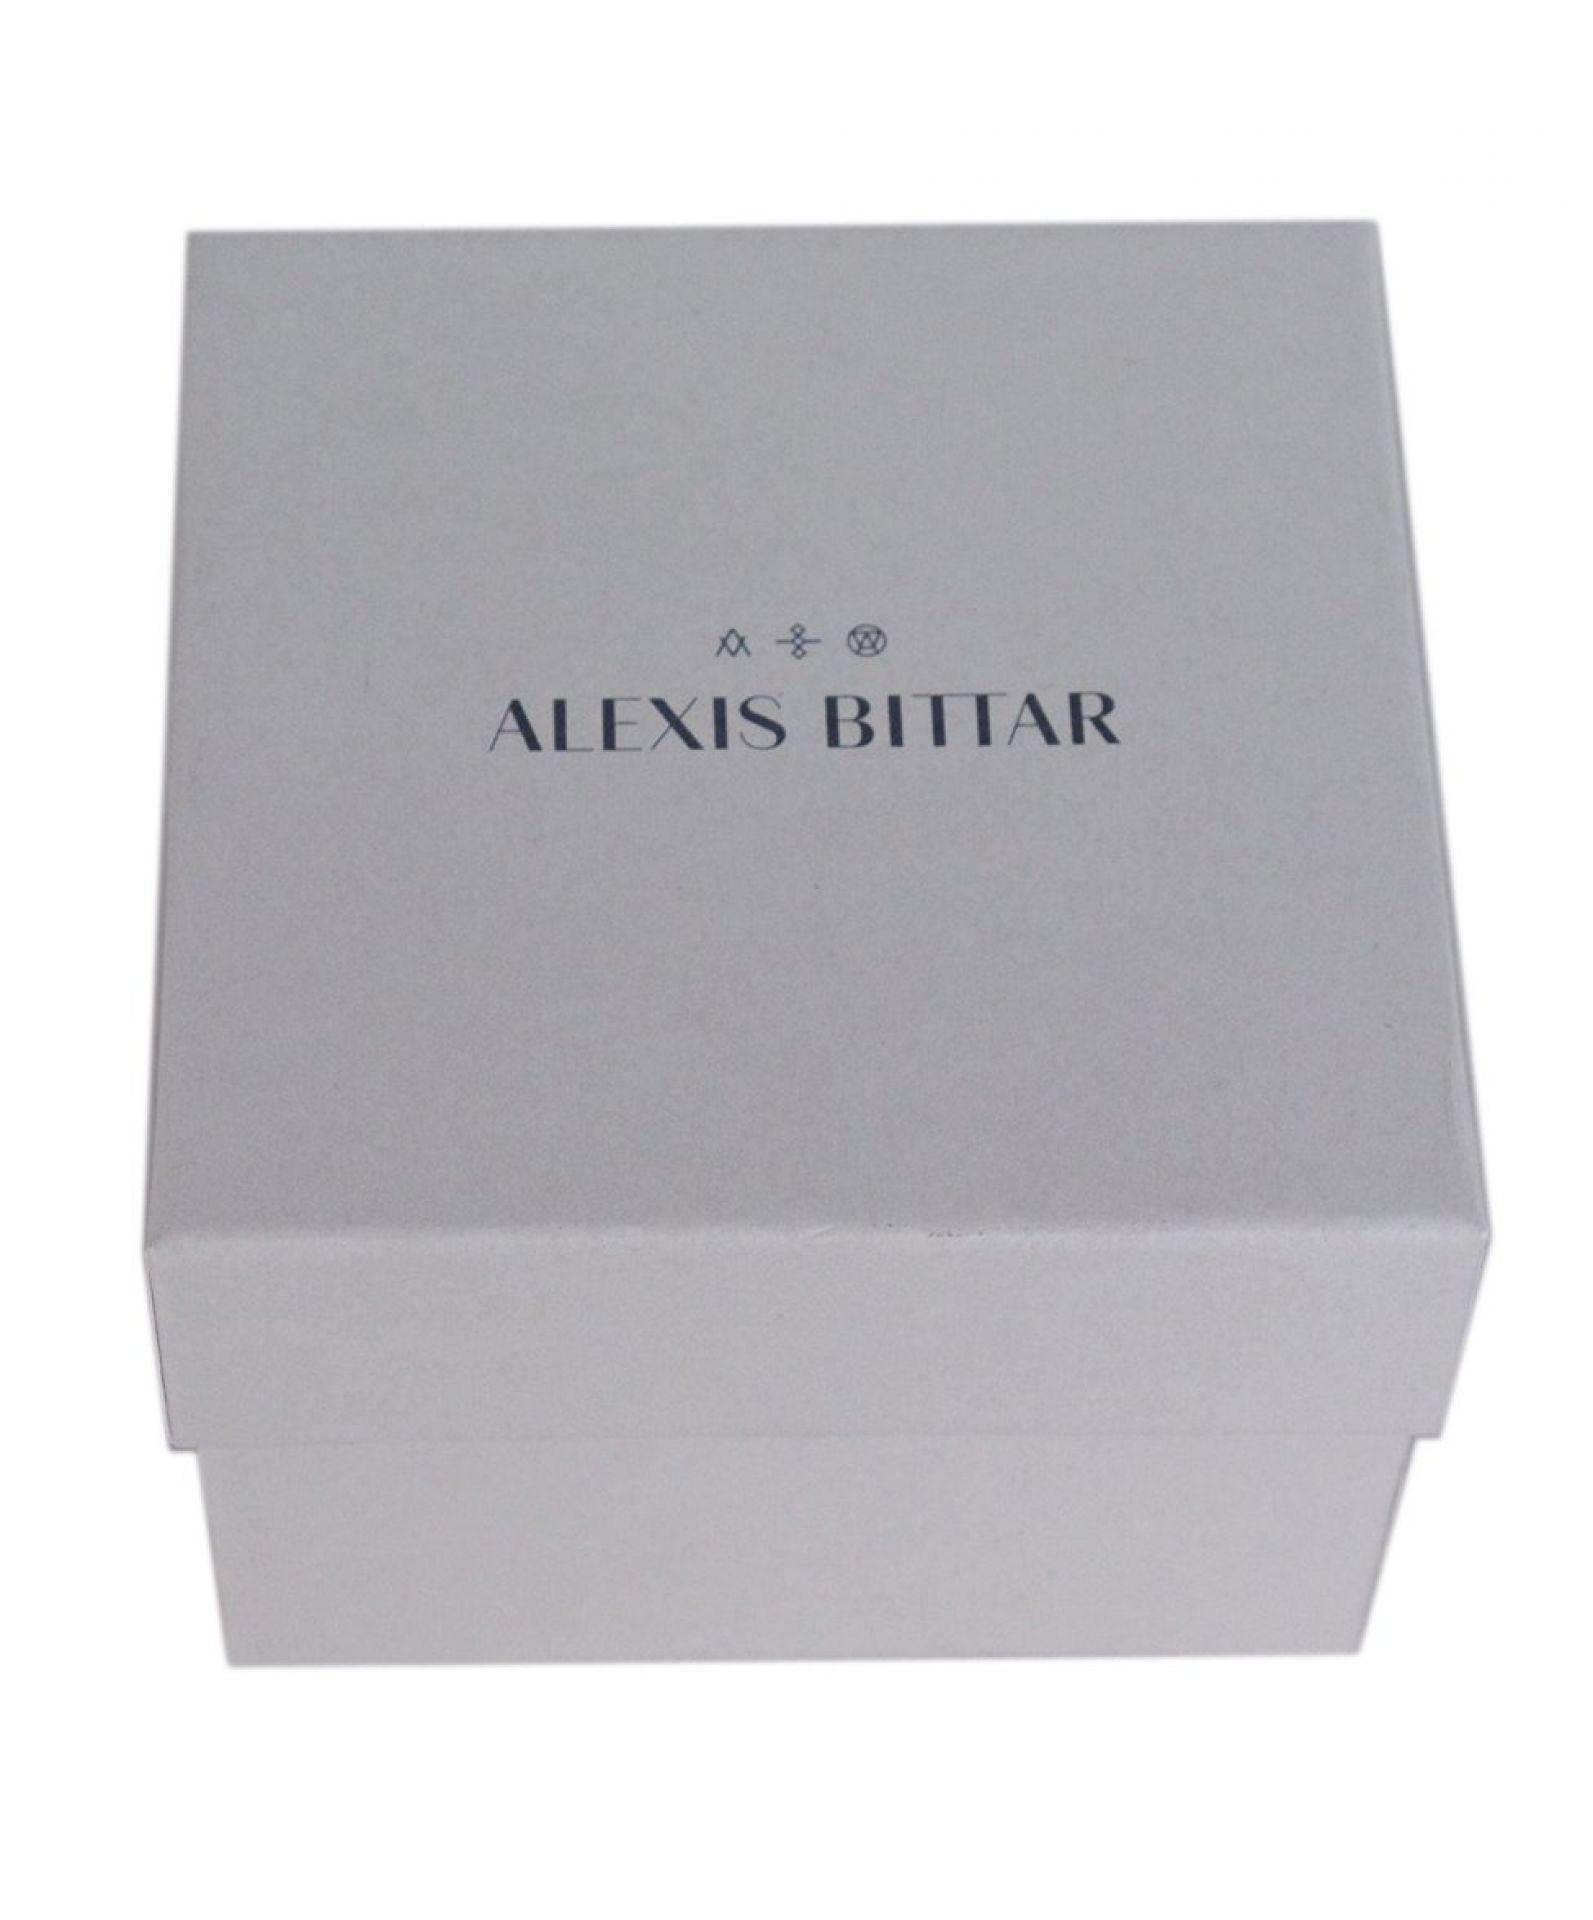 ALEXIS BITTAR PURPLE GREEN BLUE PINK RESIN BRACELET SET